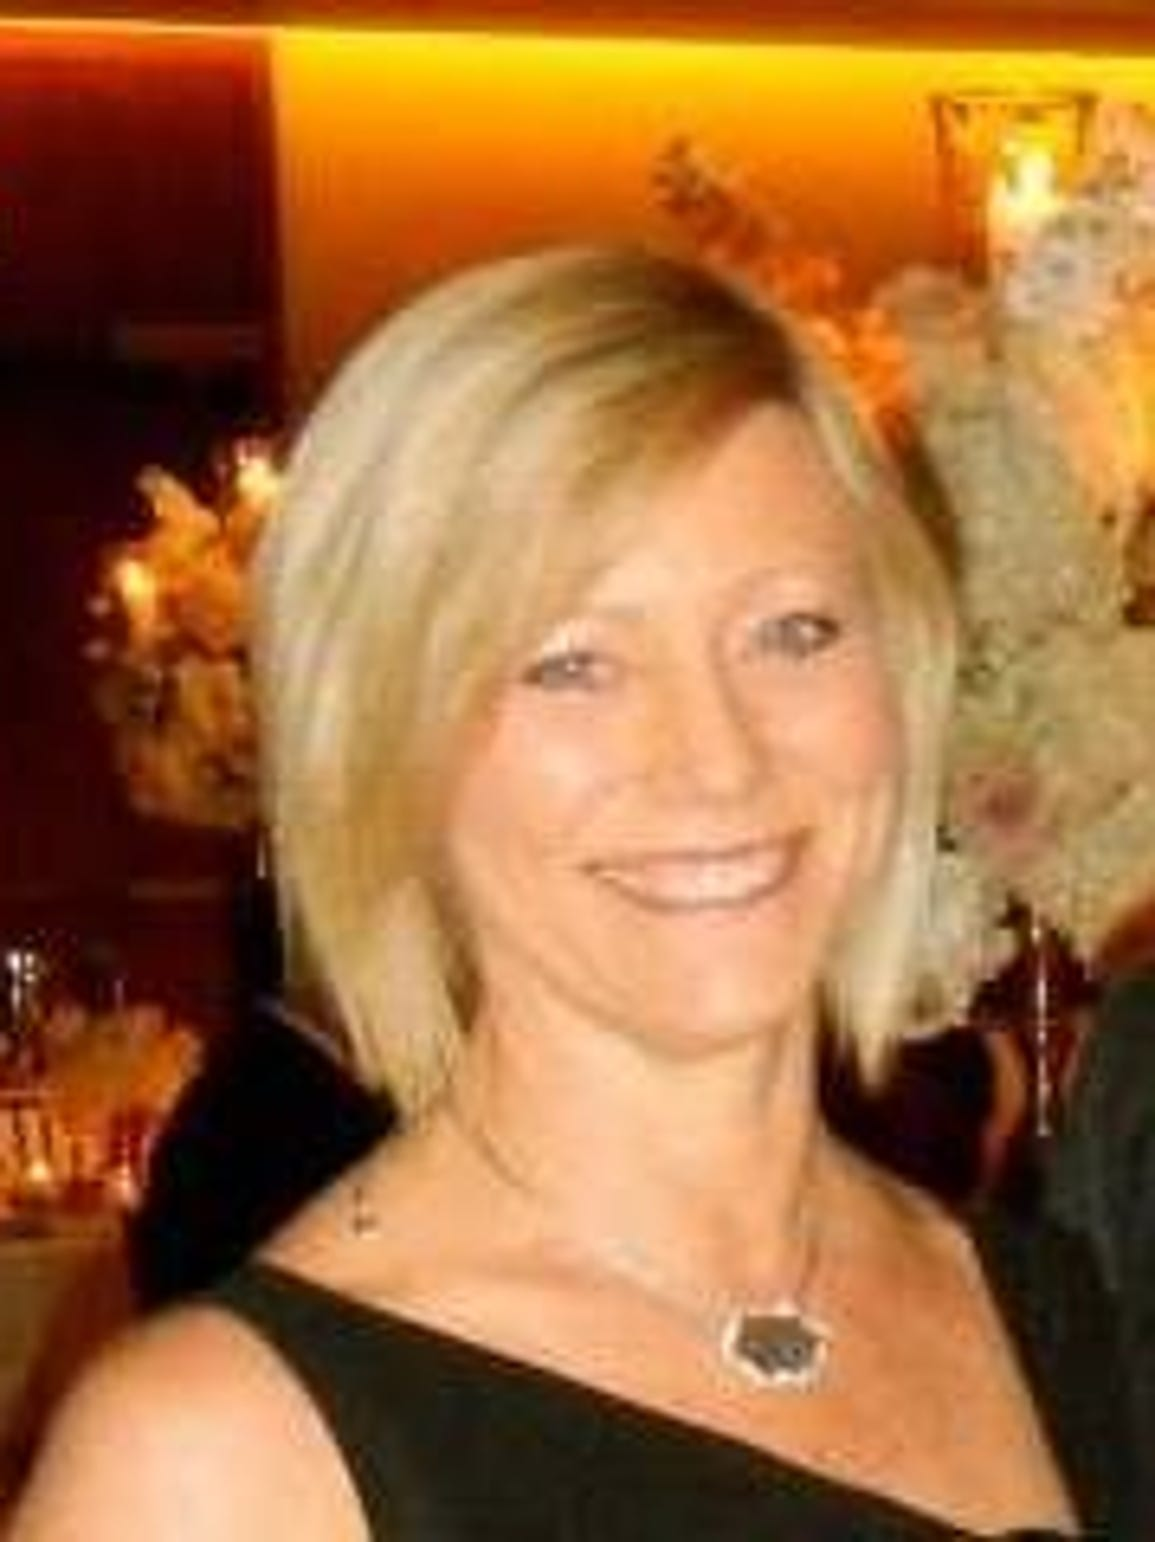 Michelle Smythe, artist and K Spcae Contermporary executive